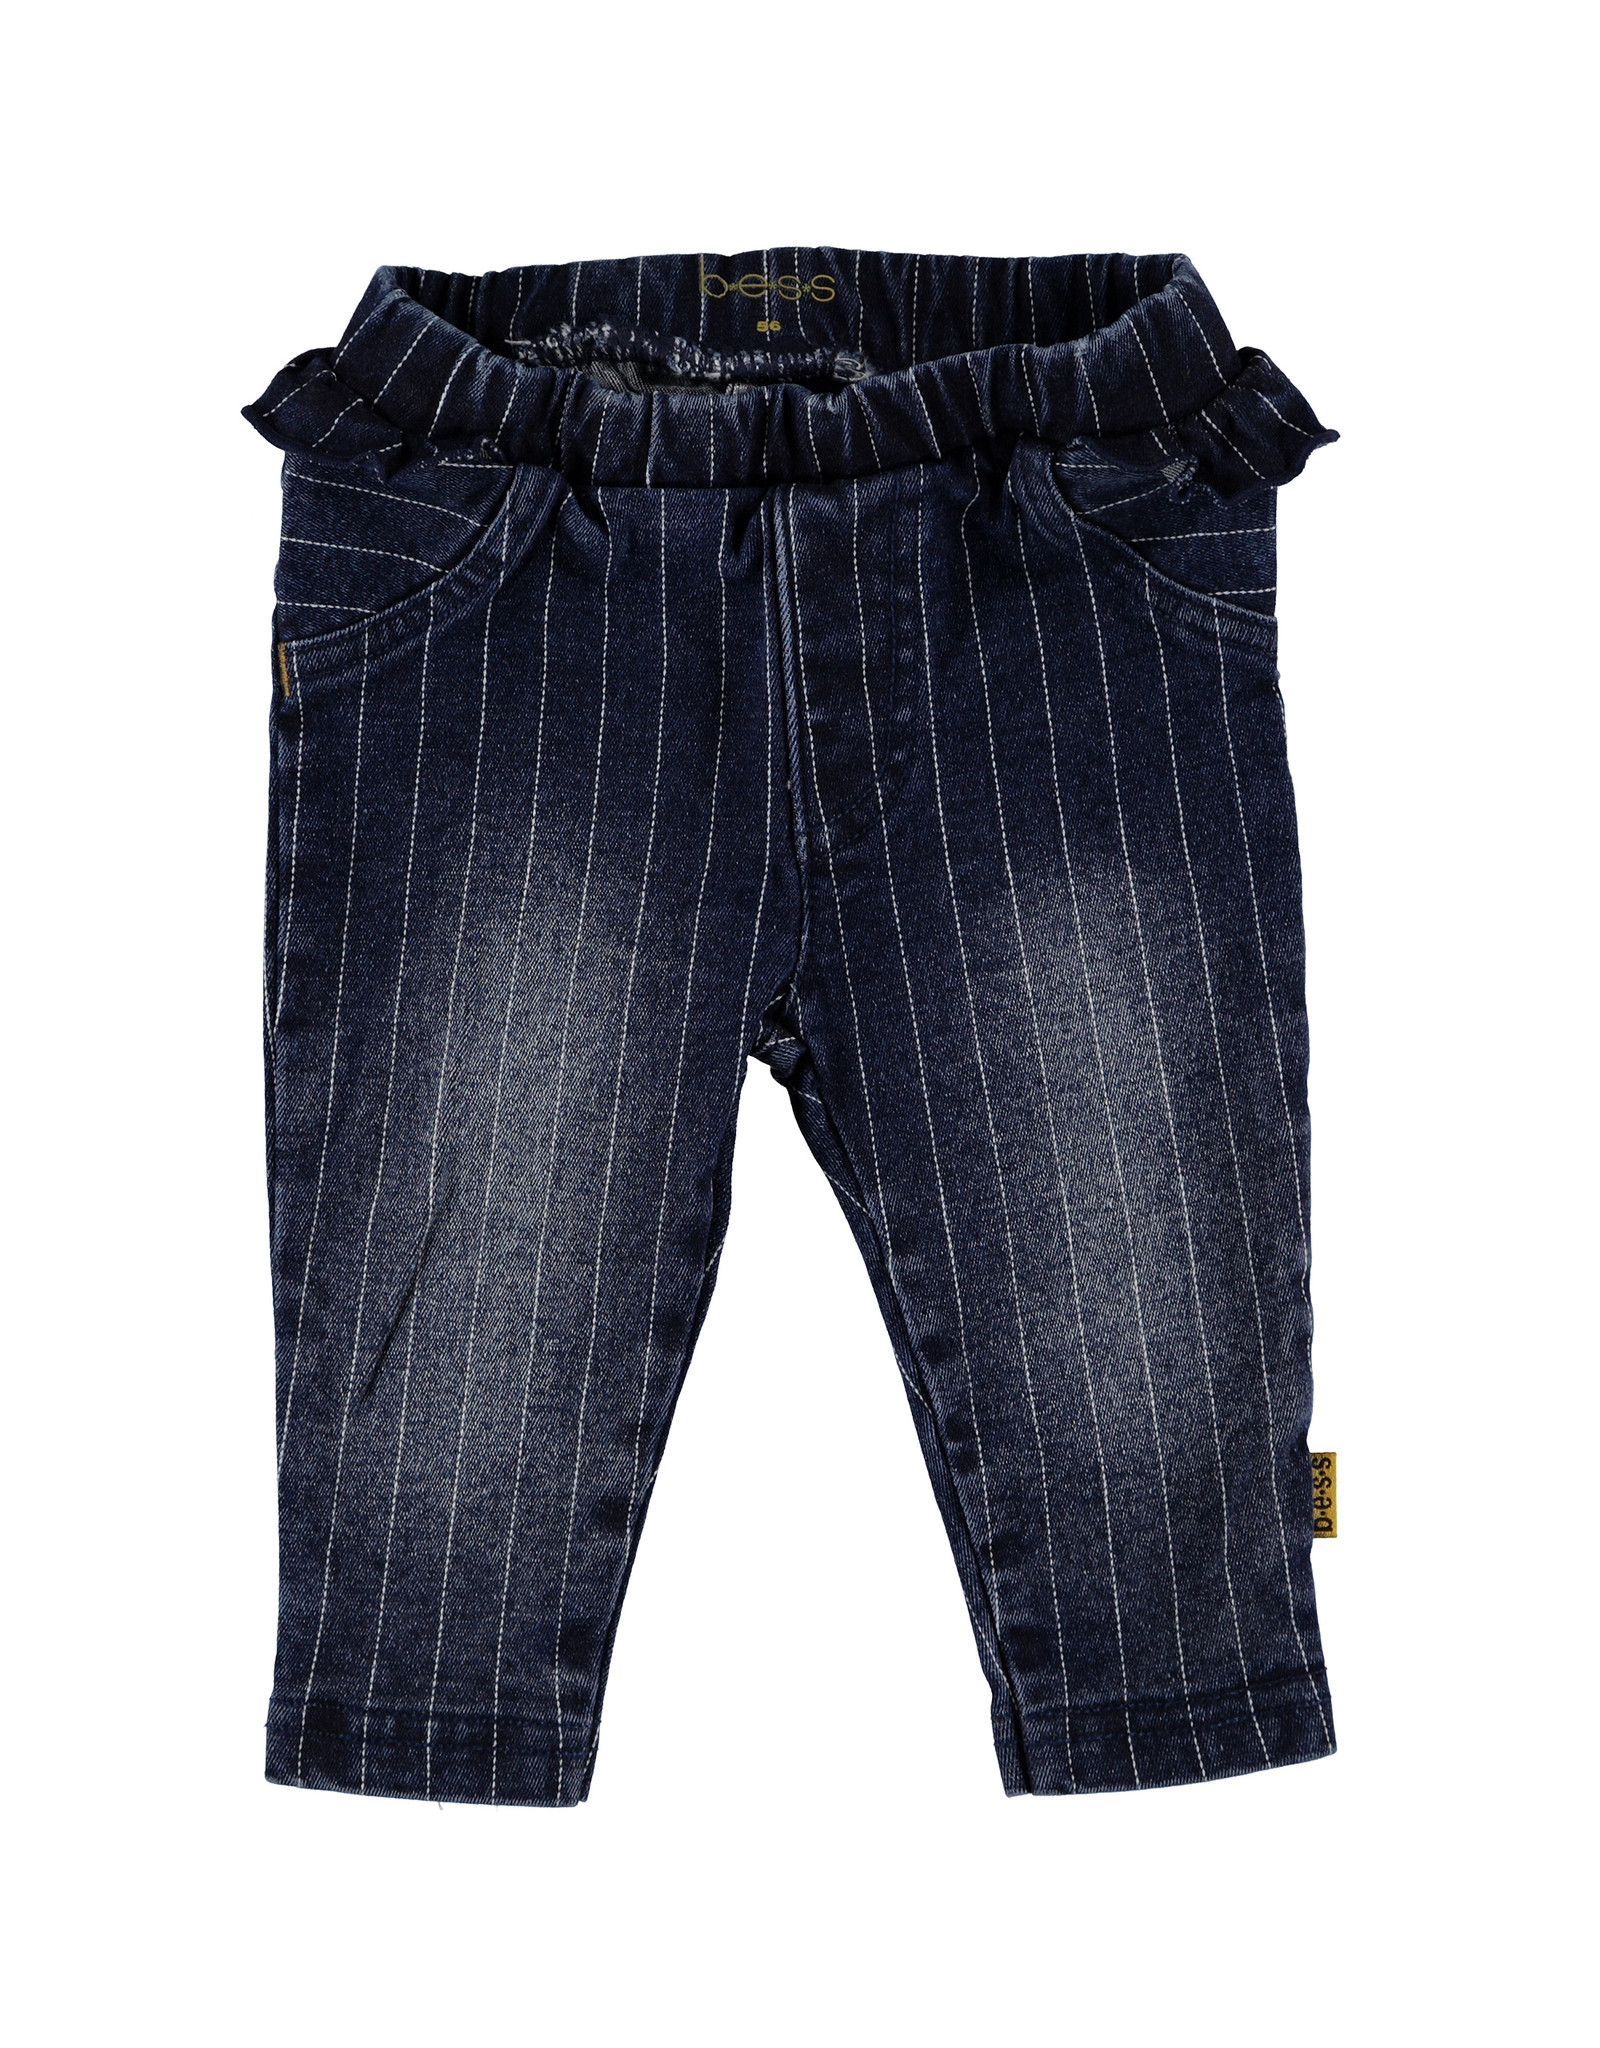 B.E.S.S. Pants Denim Striped Ruffle, Stone Wash